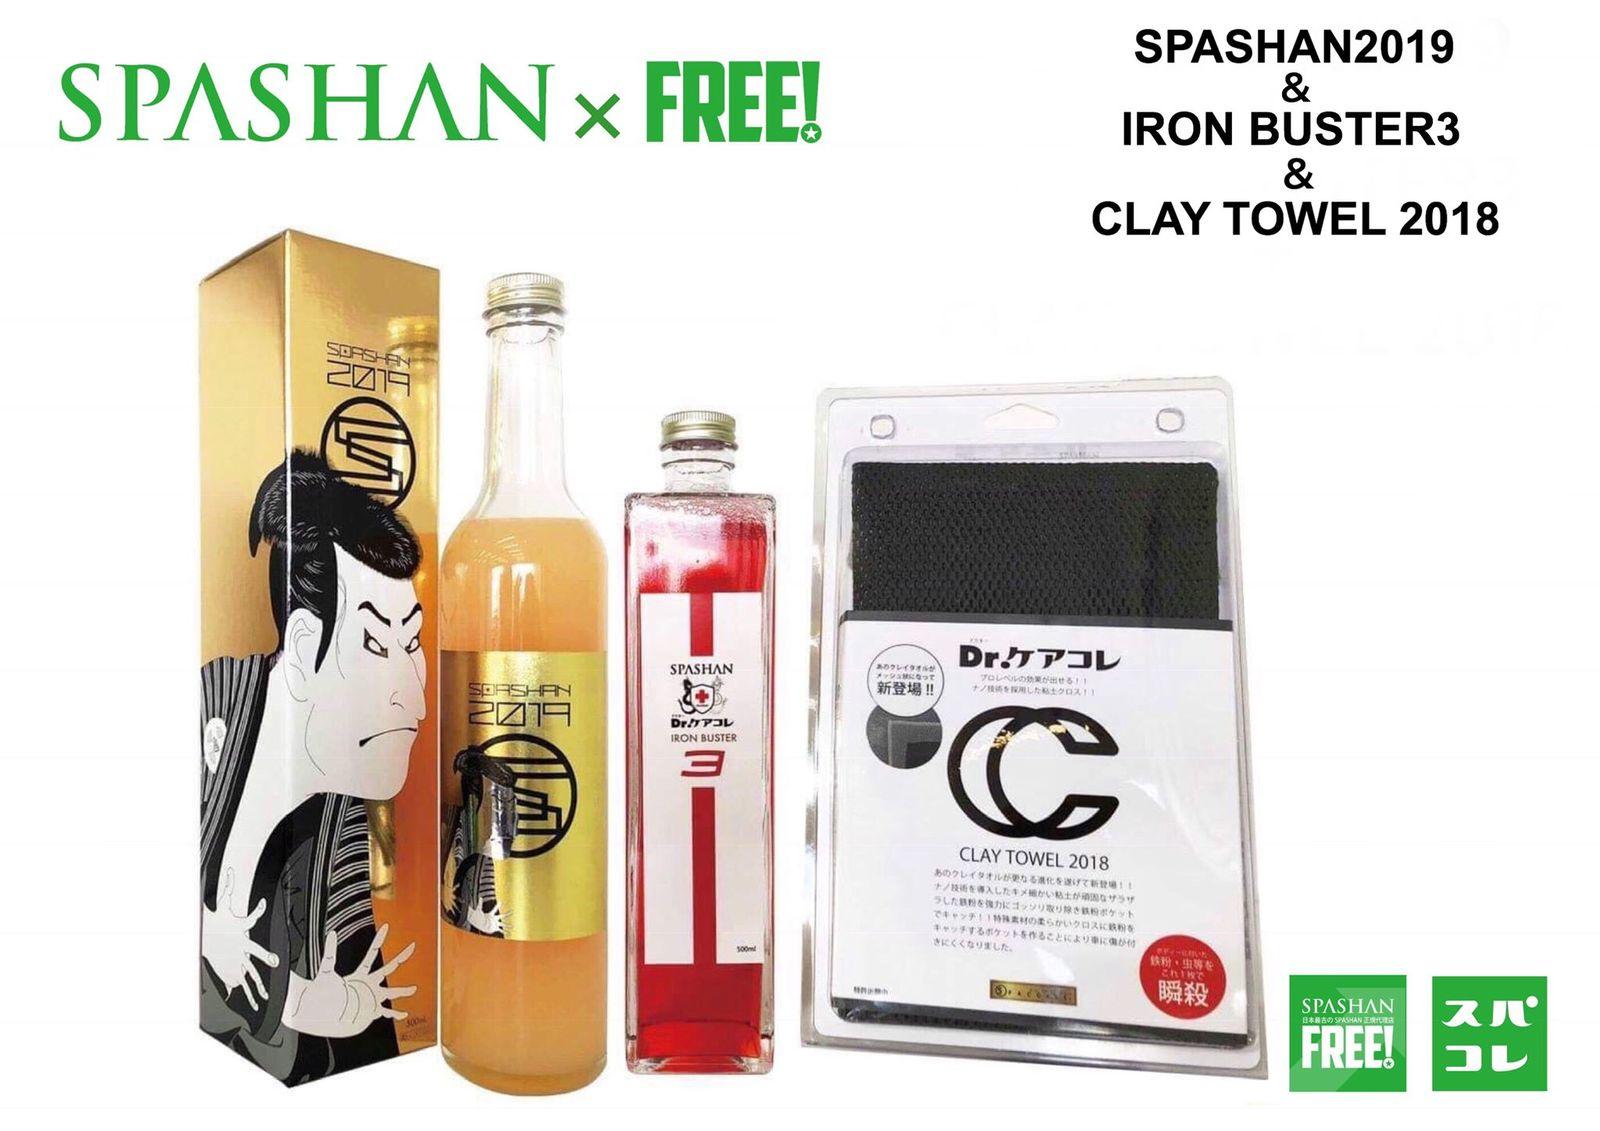 SPASHAN スパシャン2019 & クレイタオル2018 セットで アイアンバスター3 プレゼント! スパシャン ガラスコーティングシャンプー カーシャンプー 洗車 カーケア コーティング剤